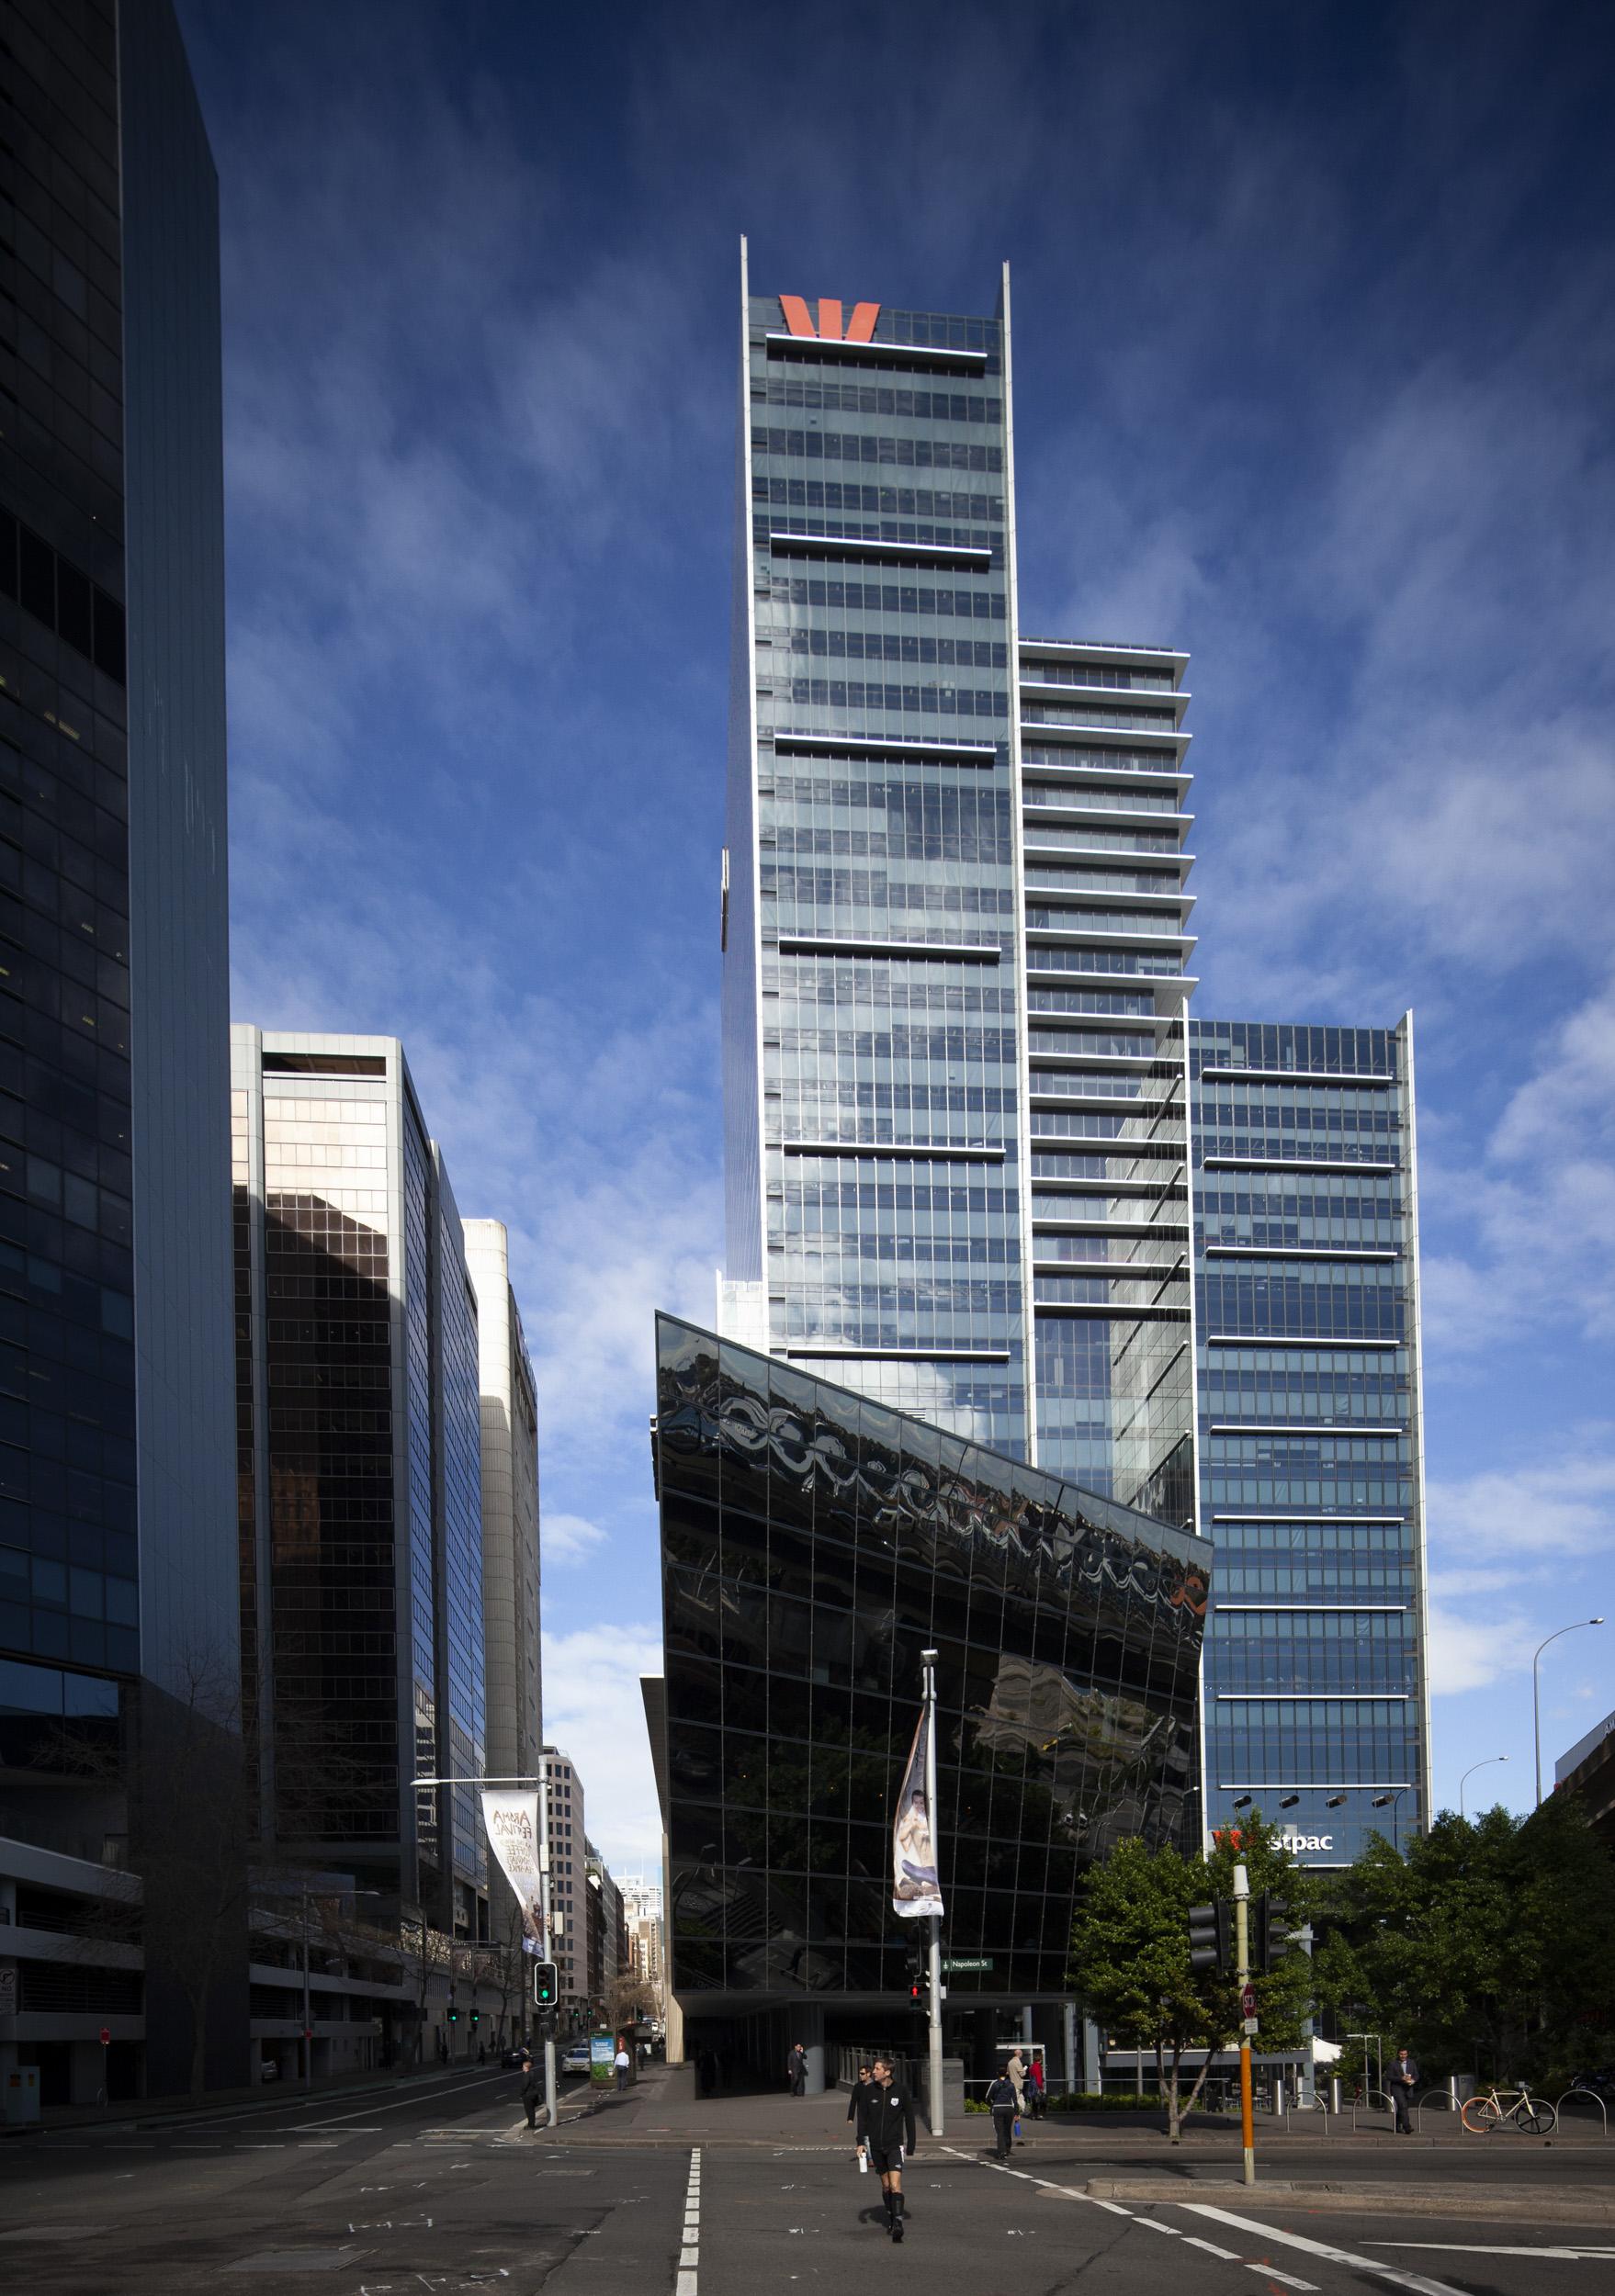 hirise_architecture_sydney_australia_05.jpg